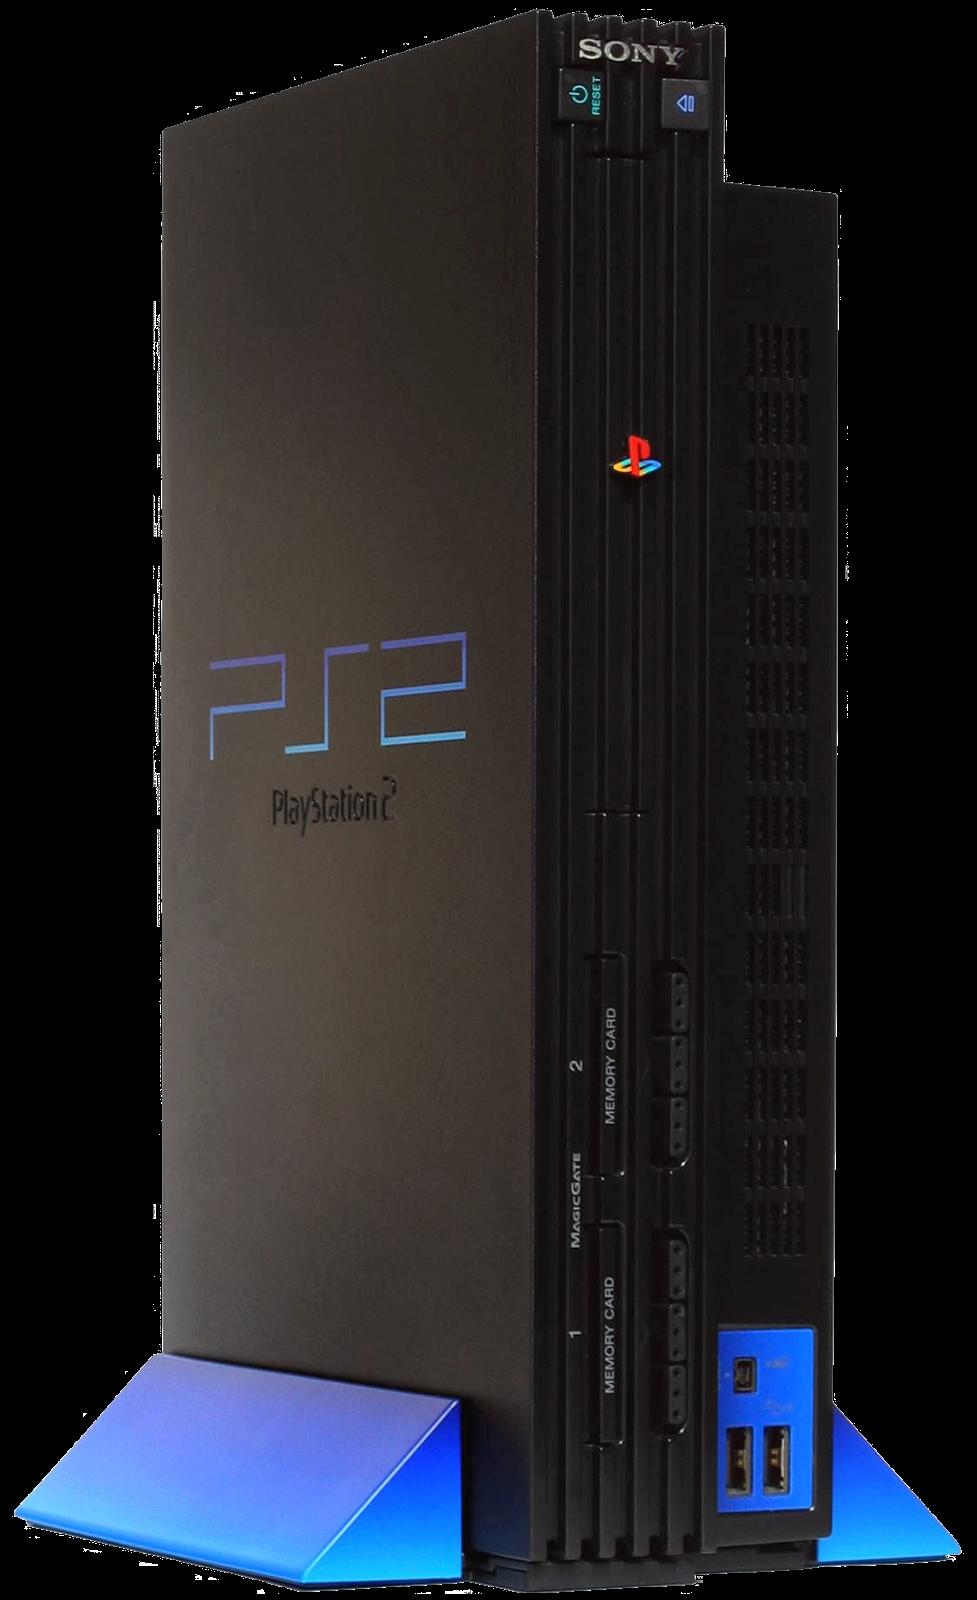 videojuegos play station 2: